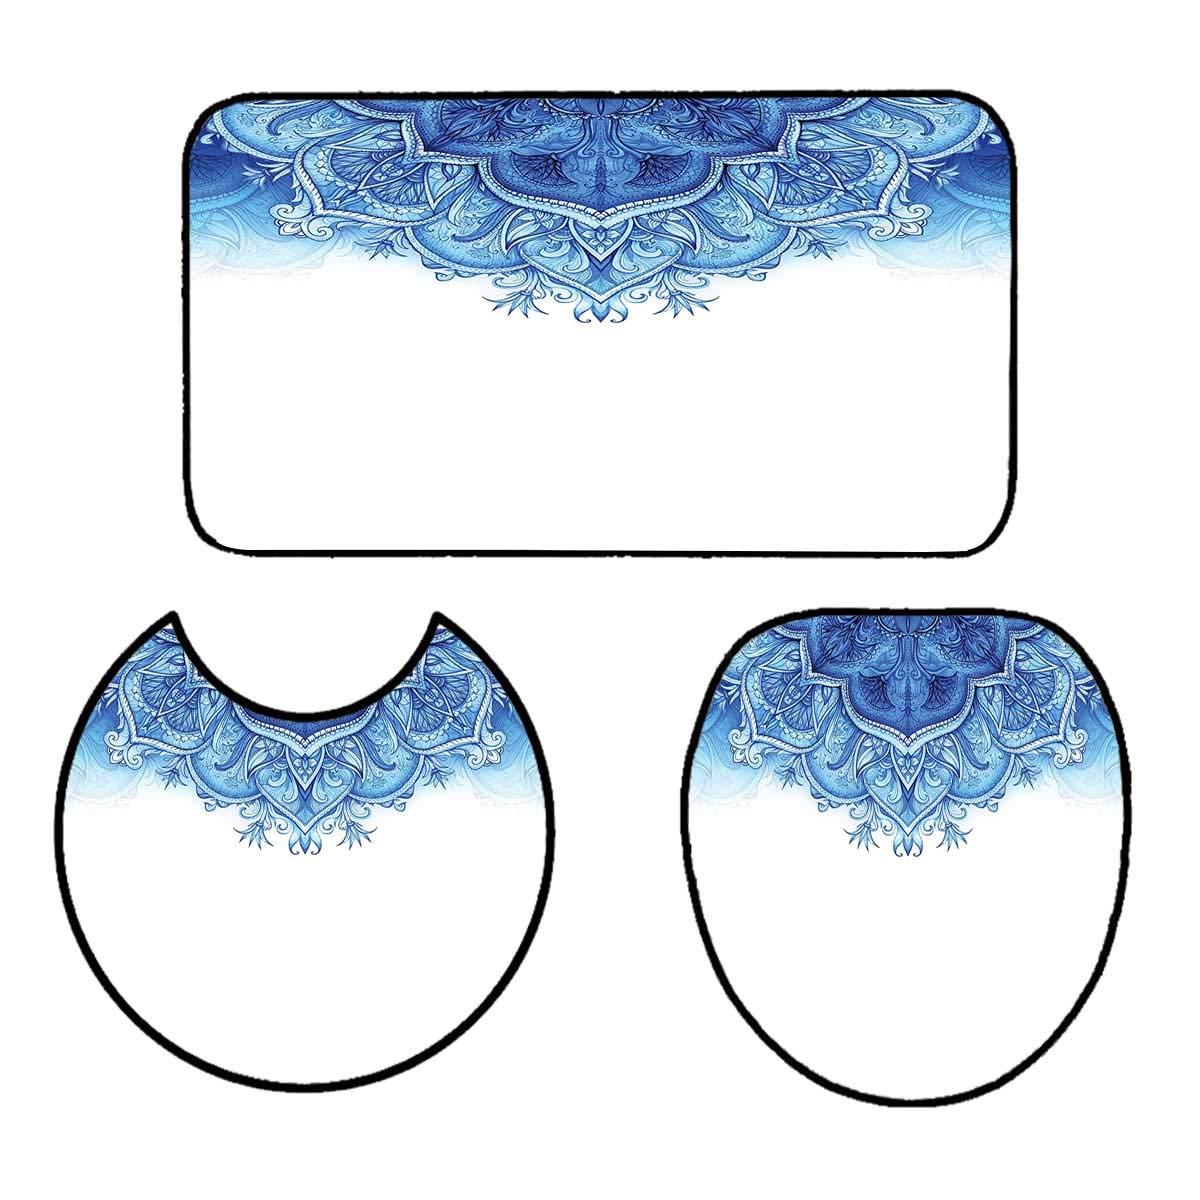 qianhehome 3 Piece Anti-Slip mat Set Educational Solar System Planets Neptune Venus Mercury Kids Science Horizontal Art Custom Made Rug Set 15''x18''-D20-16''x24''